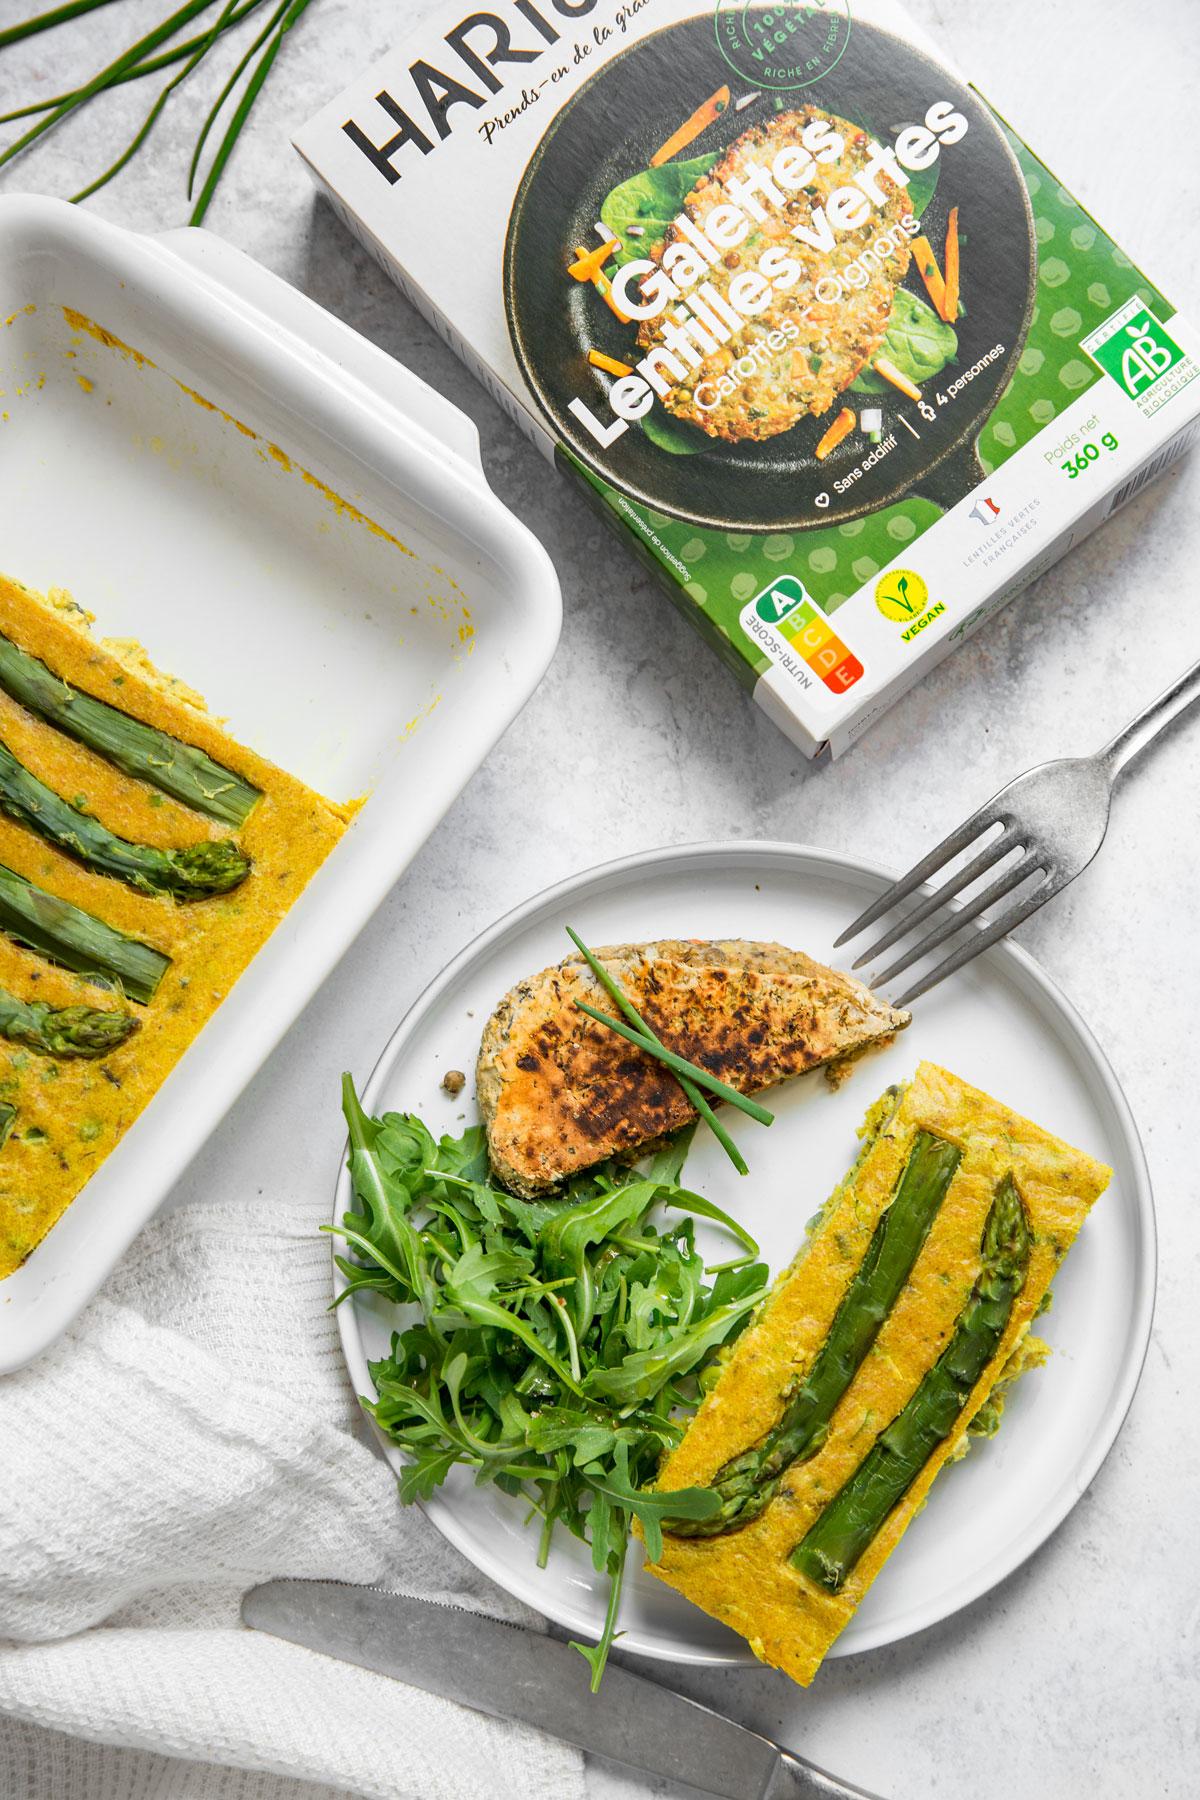 recette-legumineuse-gratin-asperge-vegetarien-clafouti